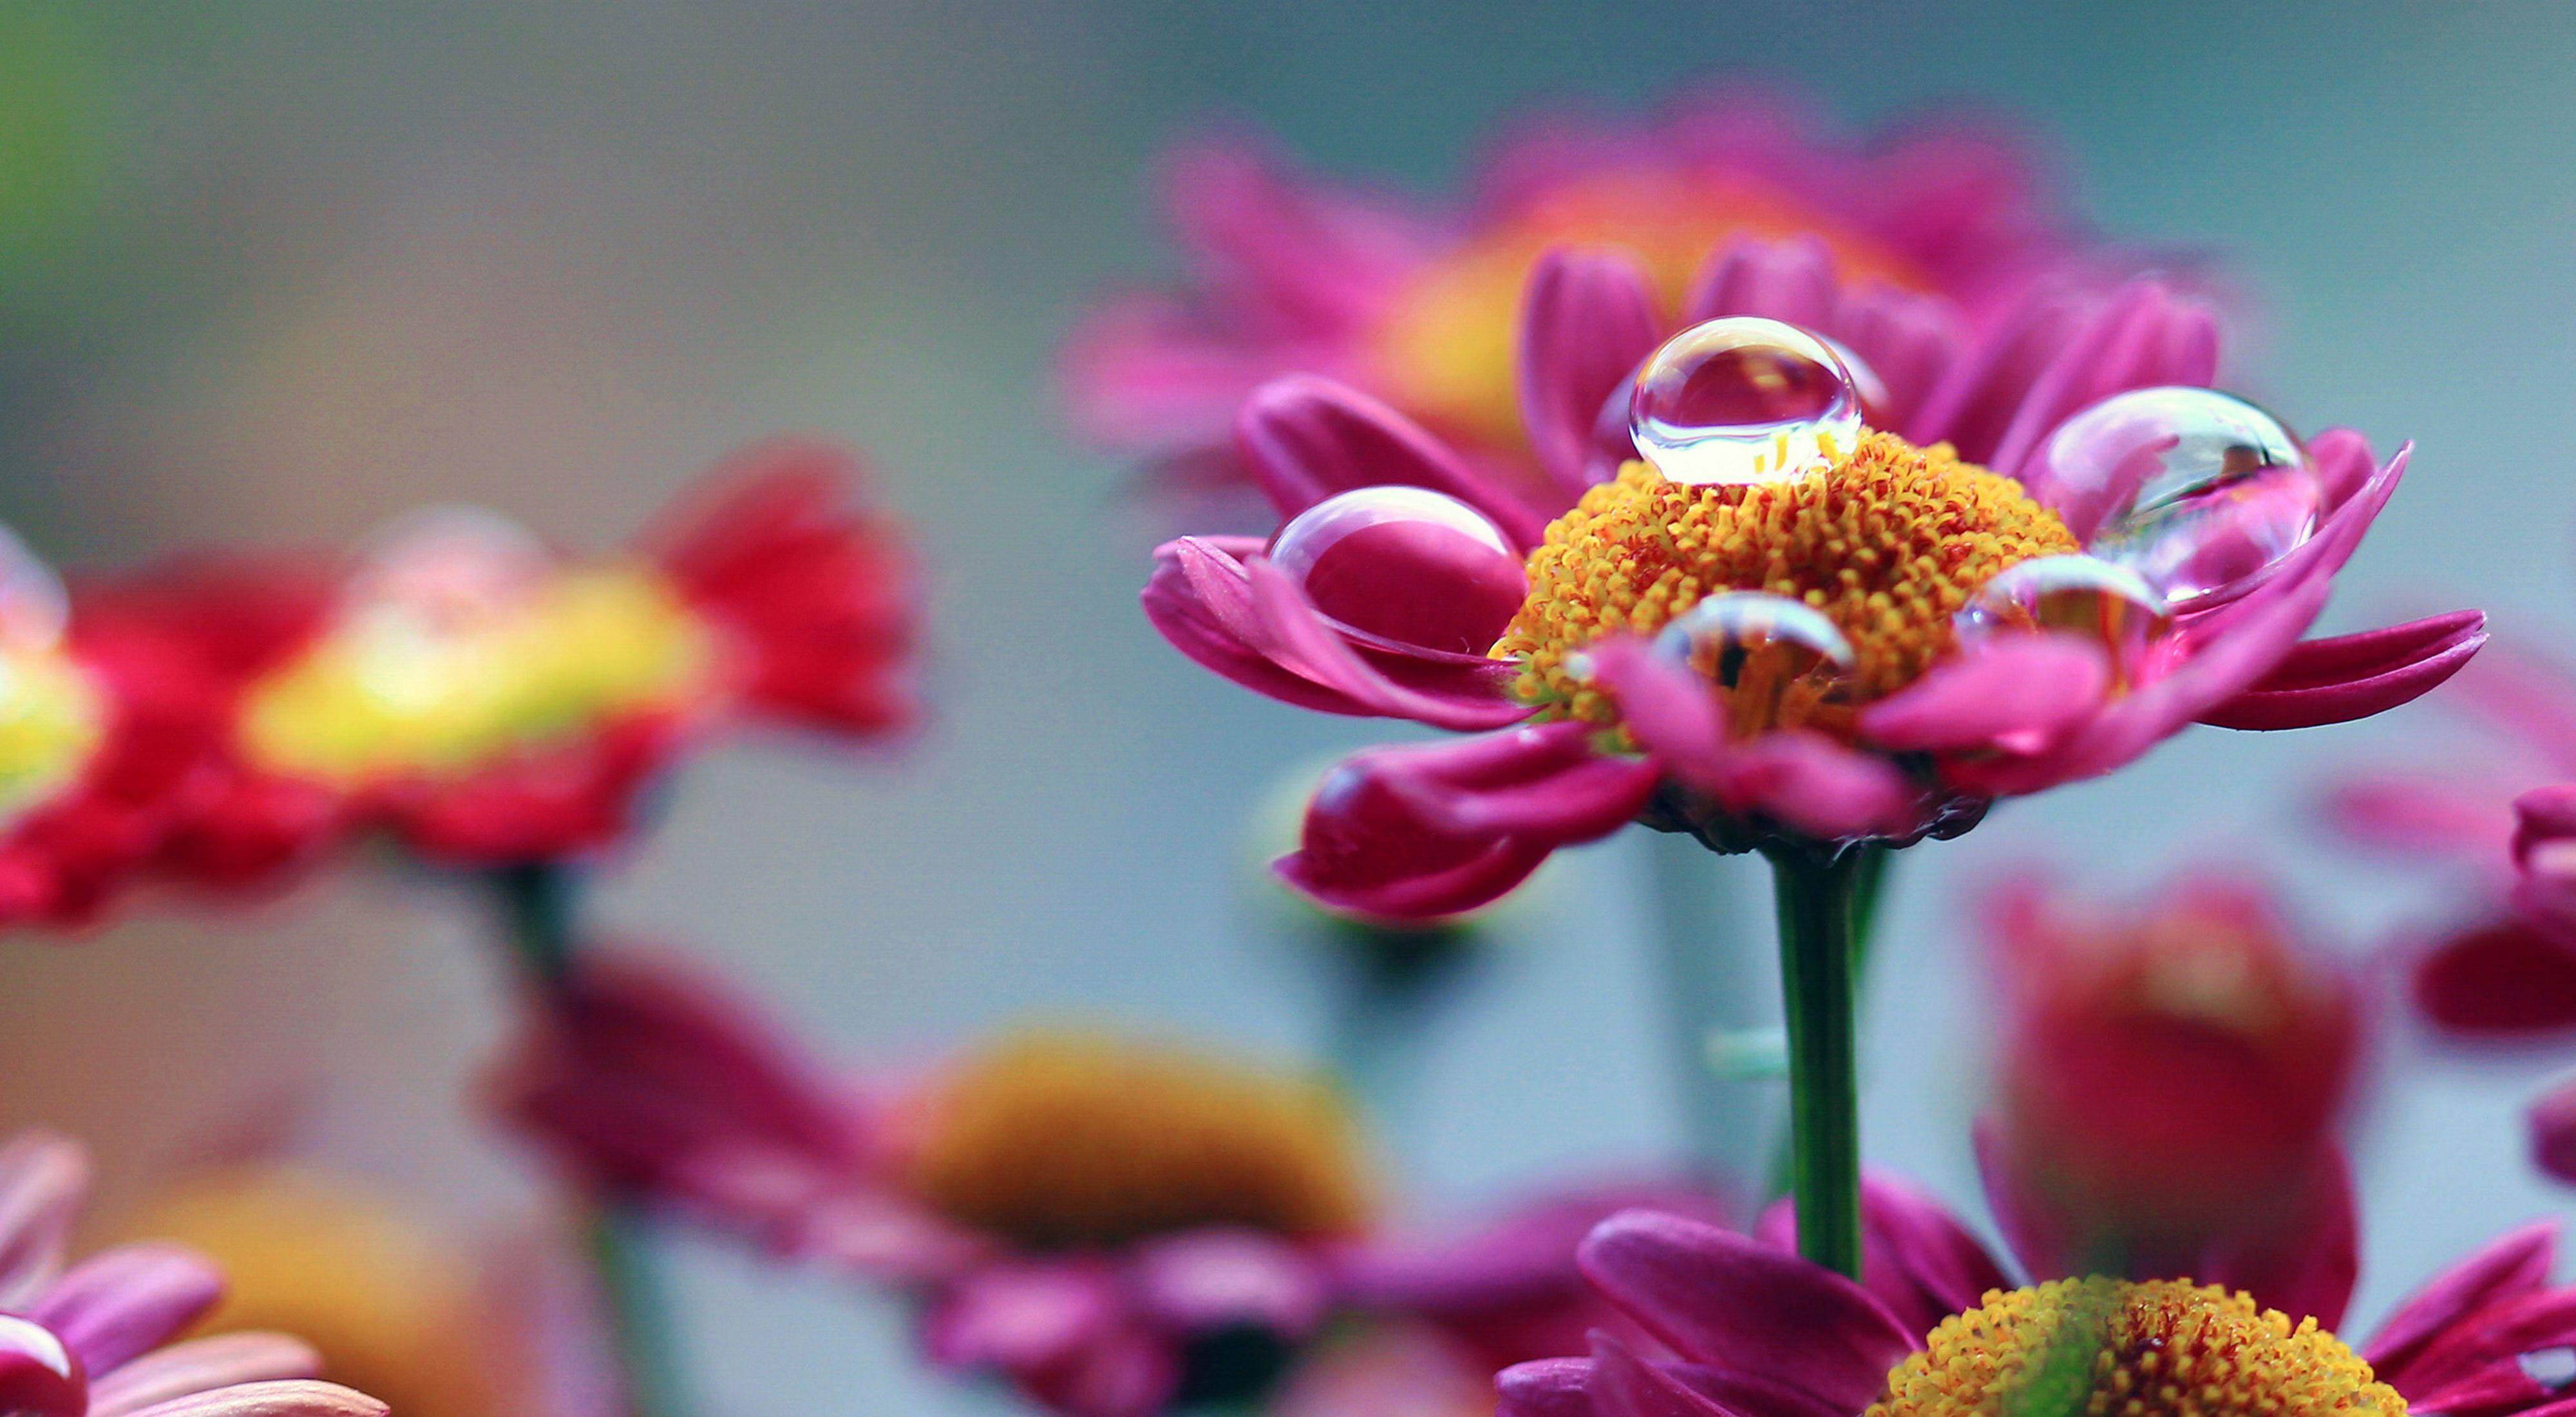 Water droplet on flowers